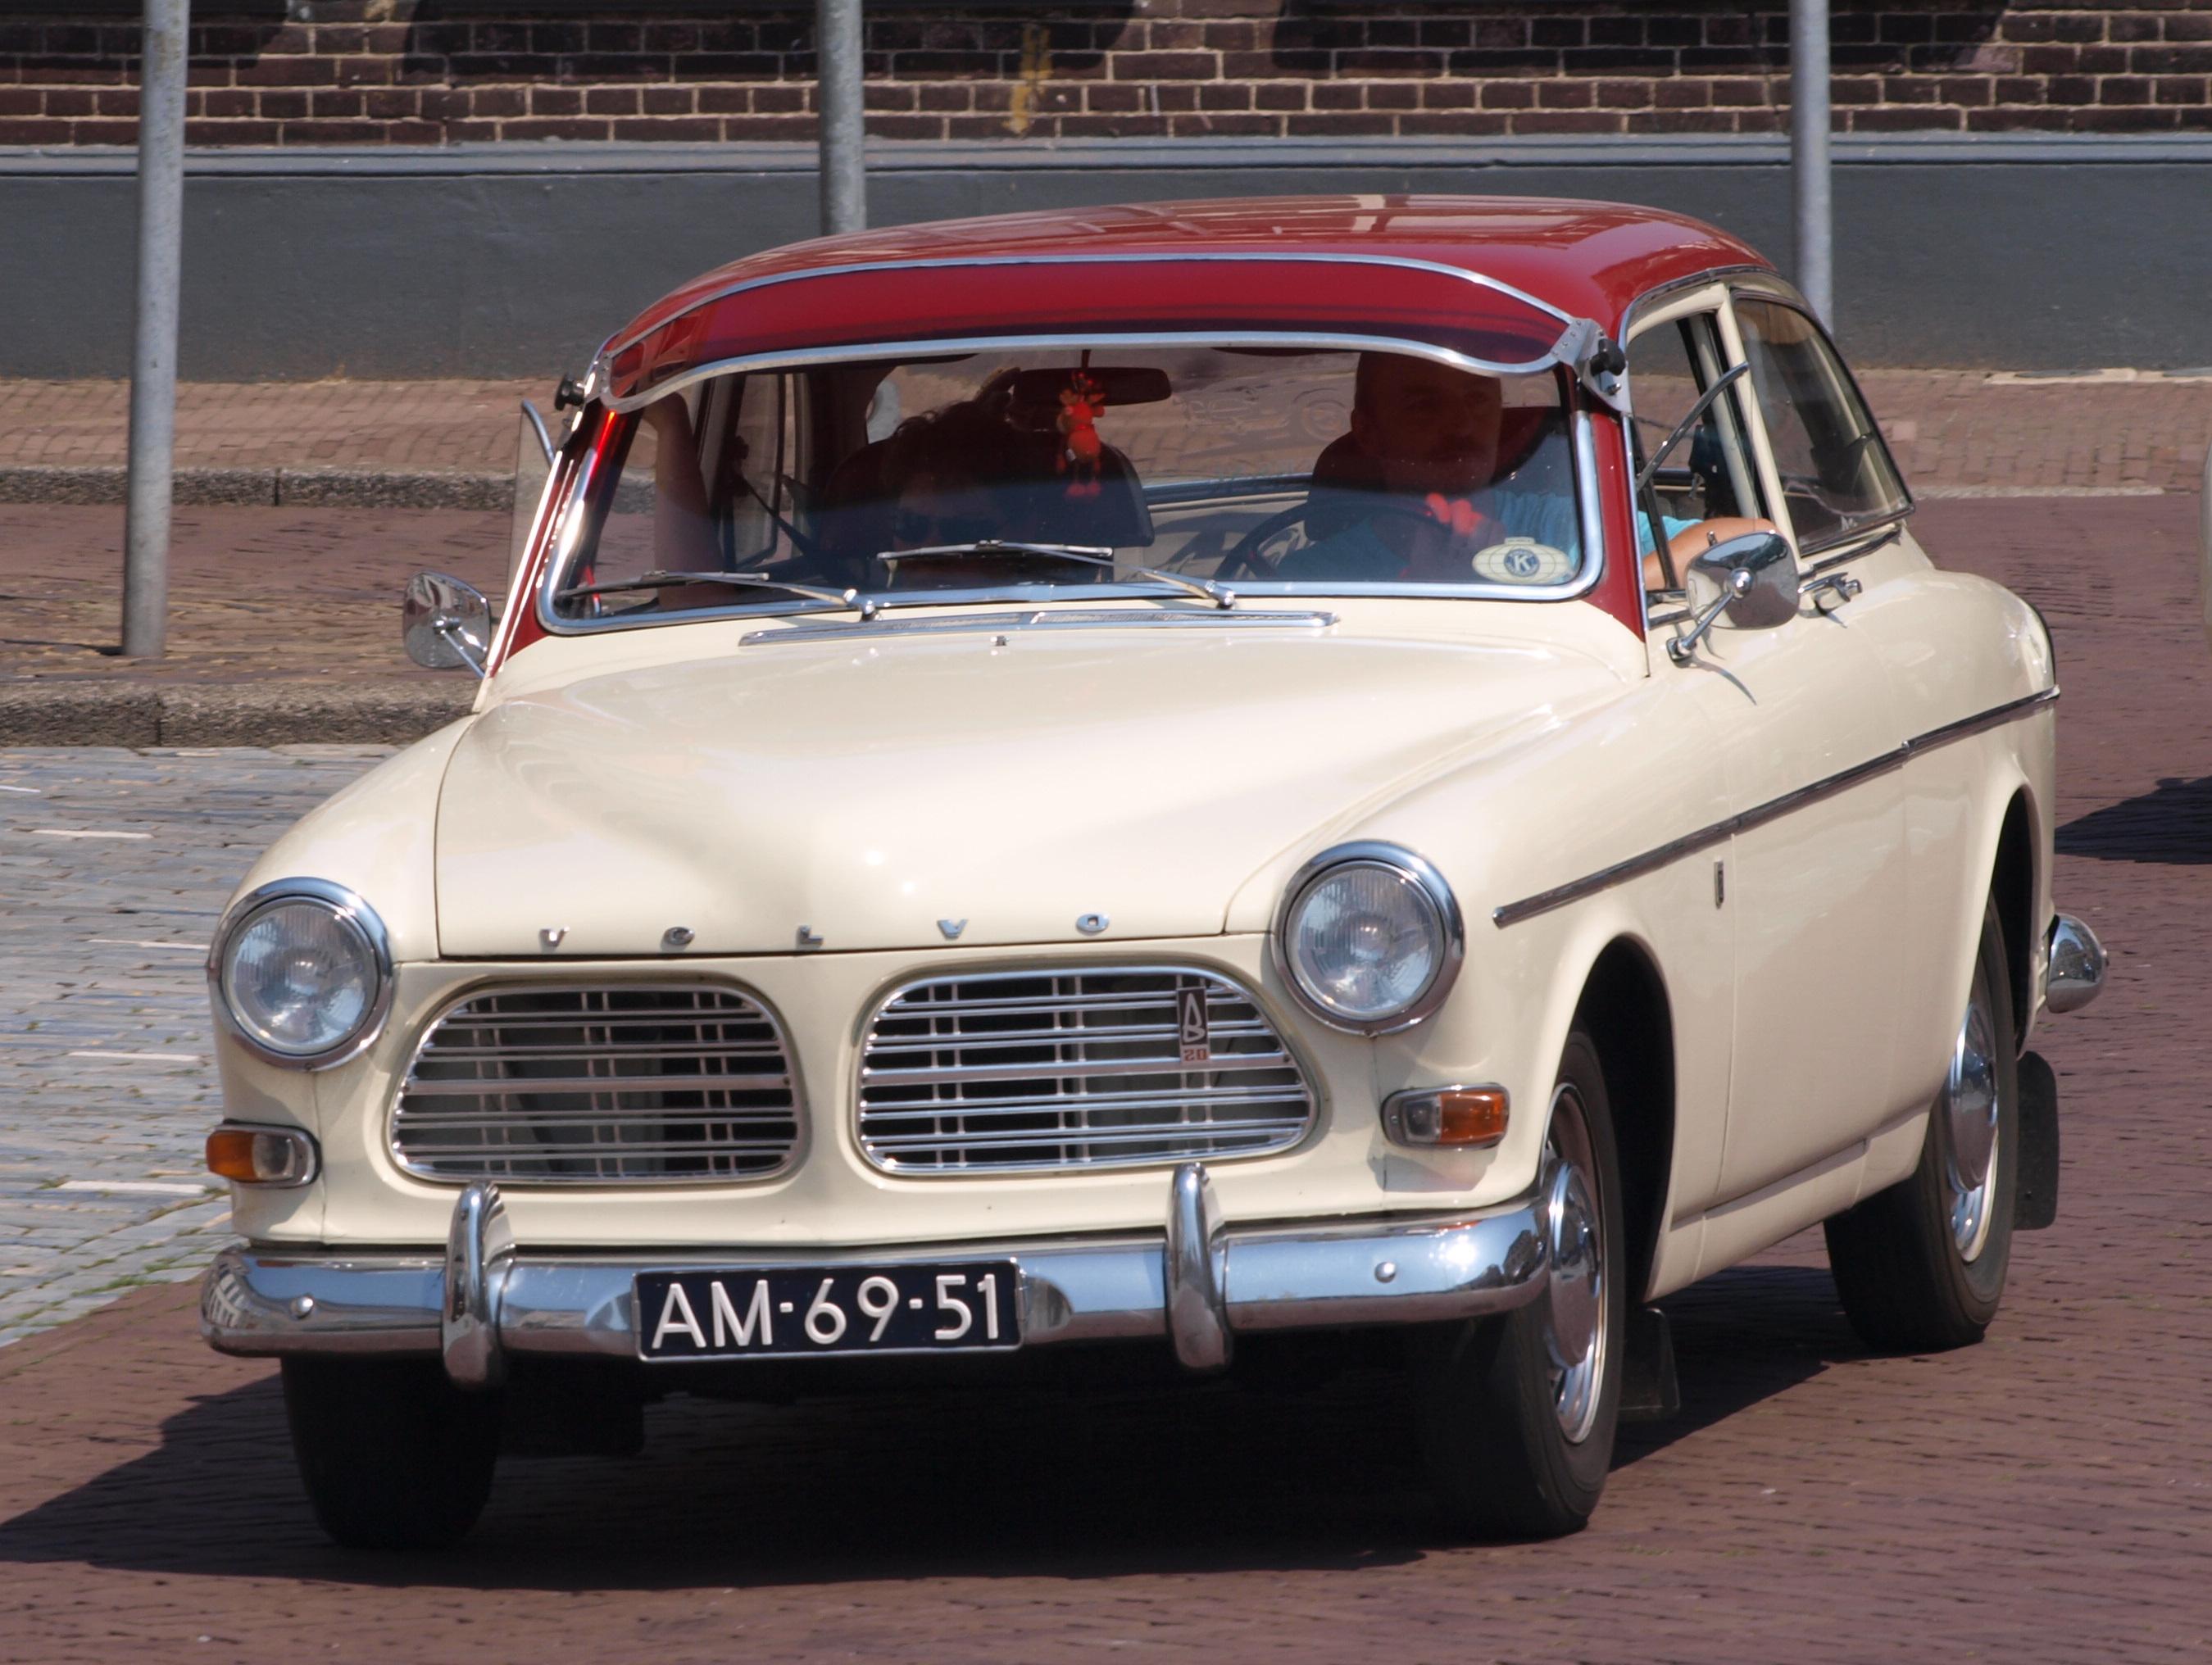 File:1969 Volvo 121 AM-69-51.JPG - Wikimedia Commons